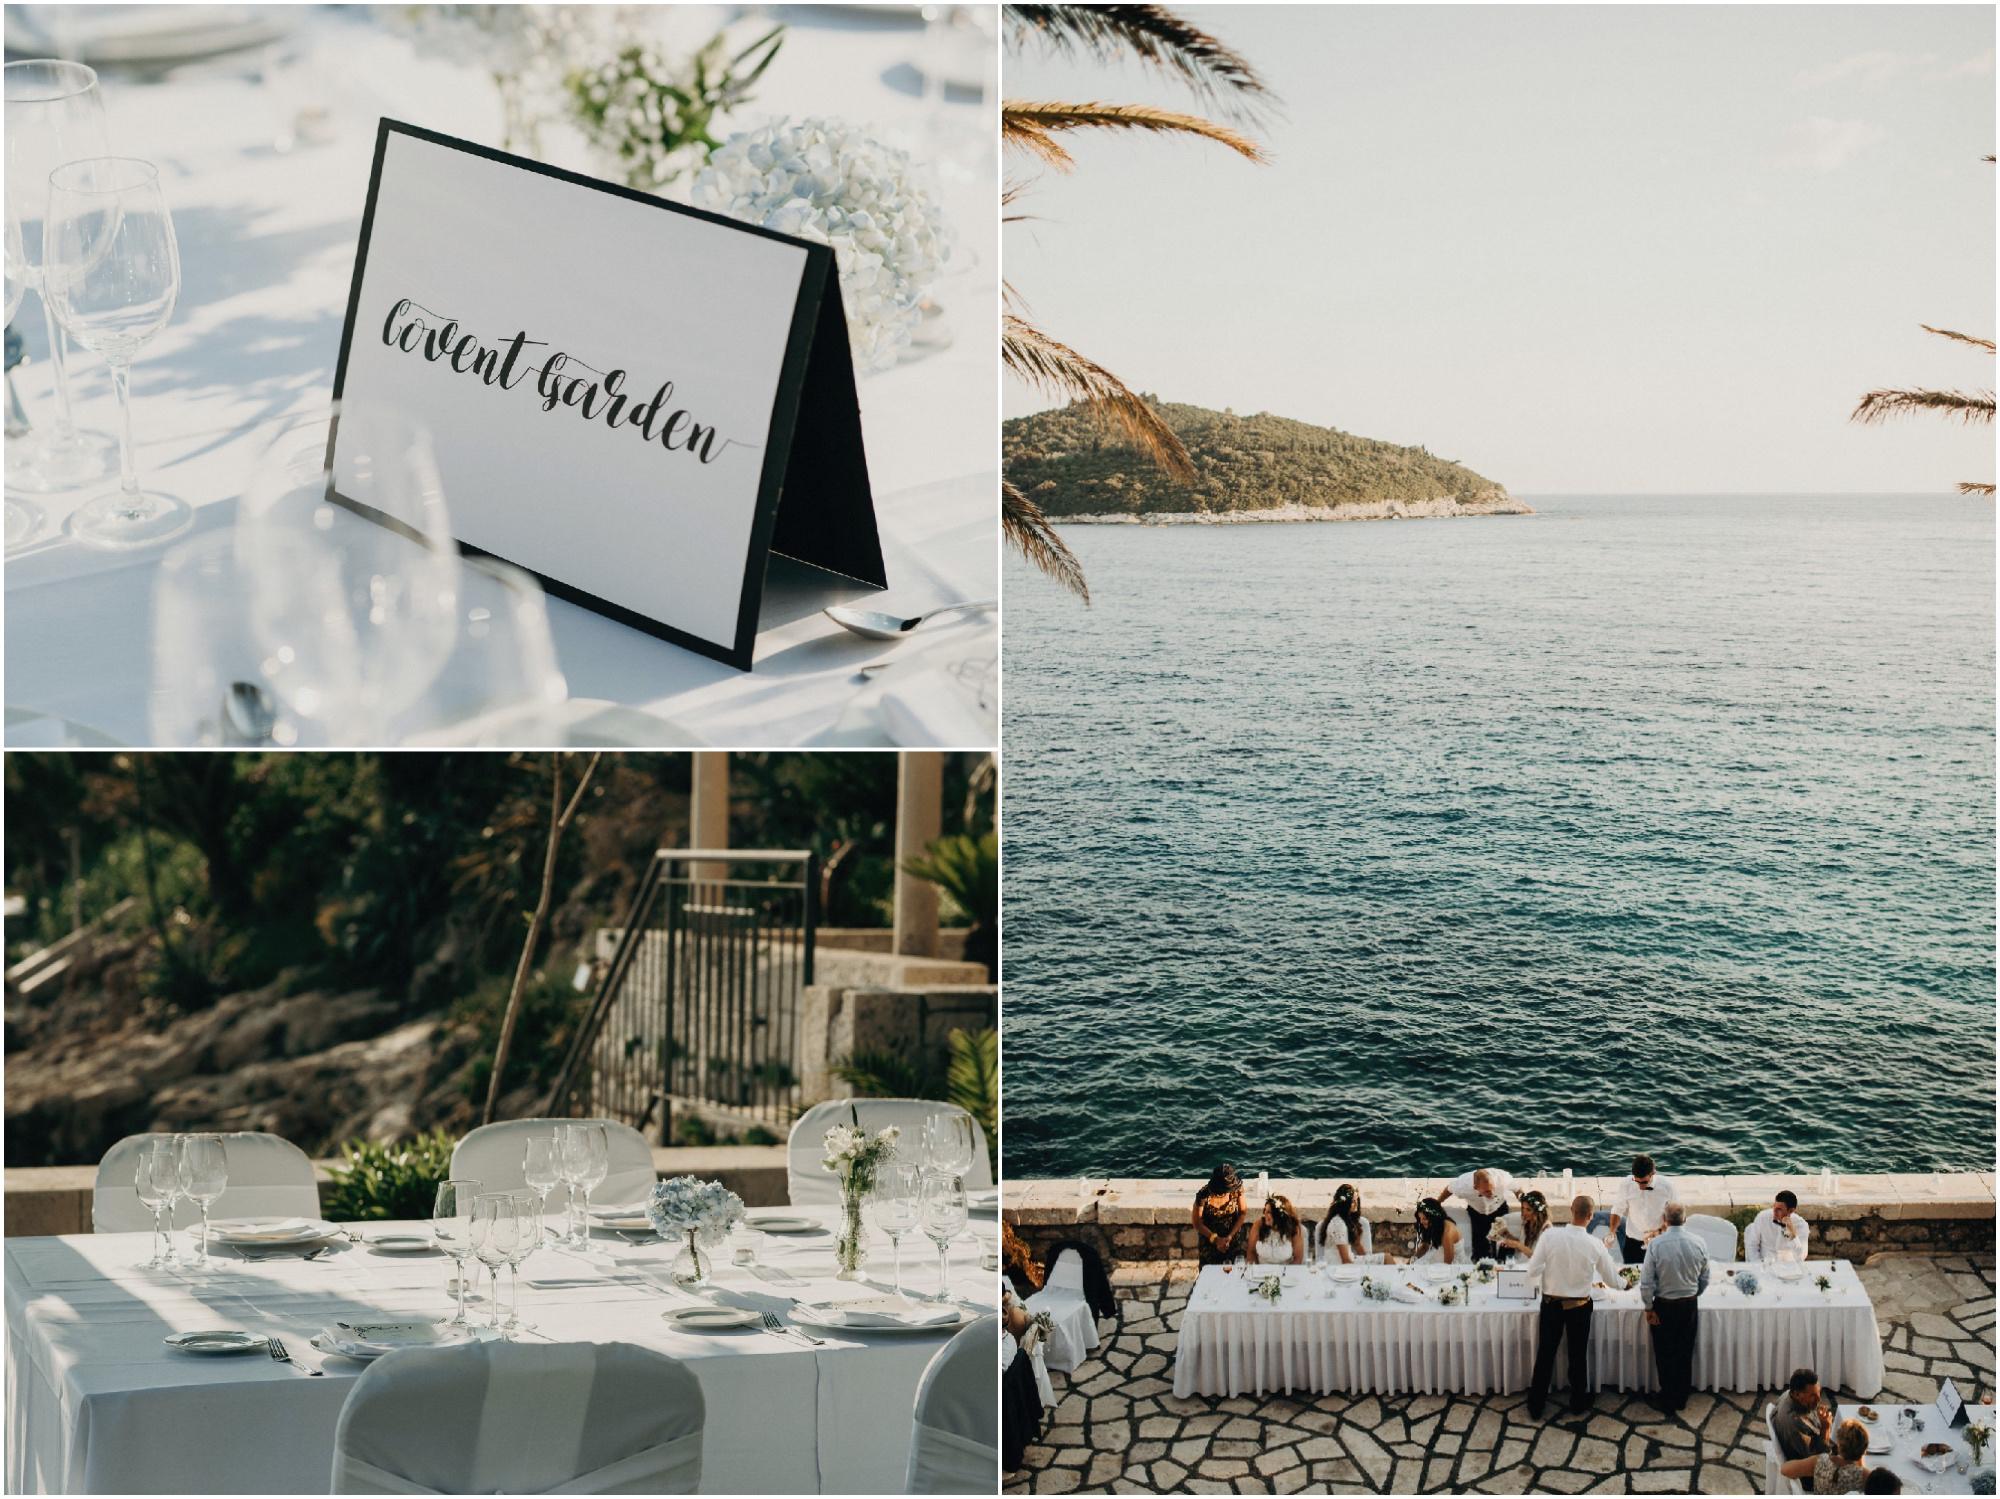 dubrovnik_croatia_wedding_photographer-jere_satamo-destination_weddings-051-web.jpg